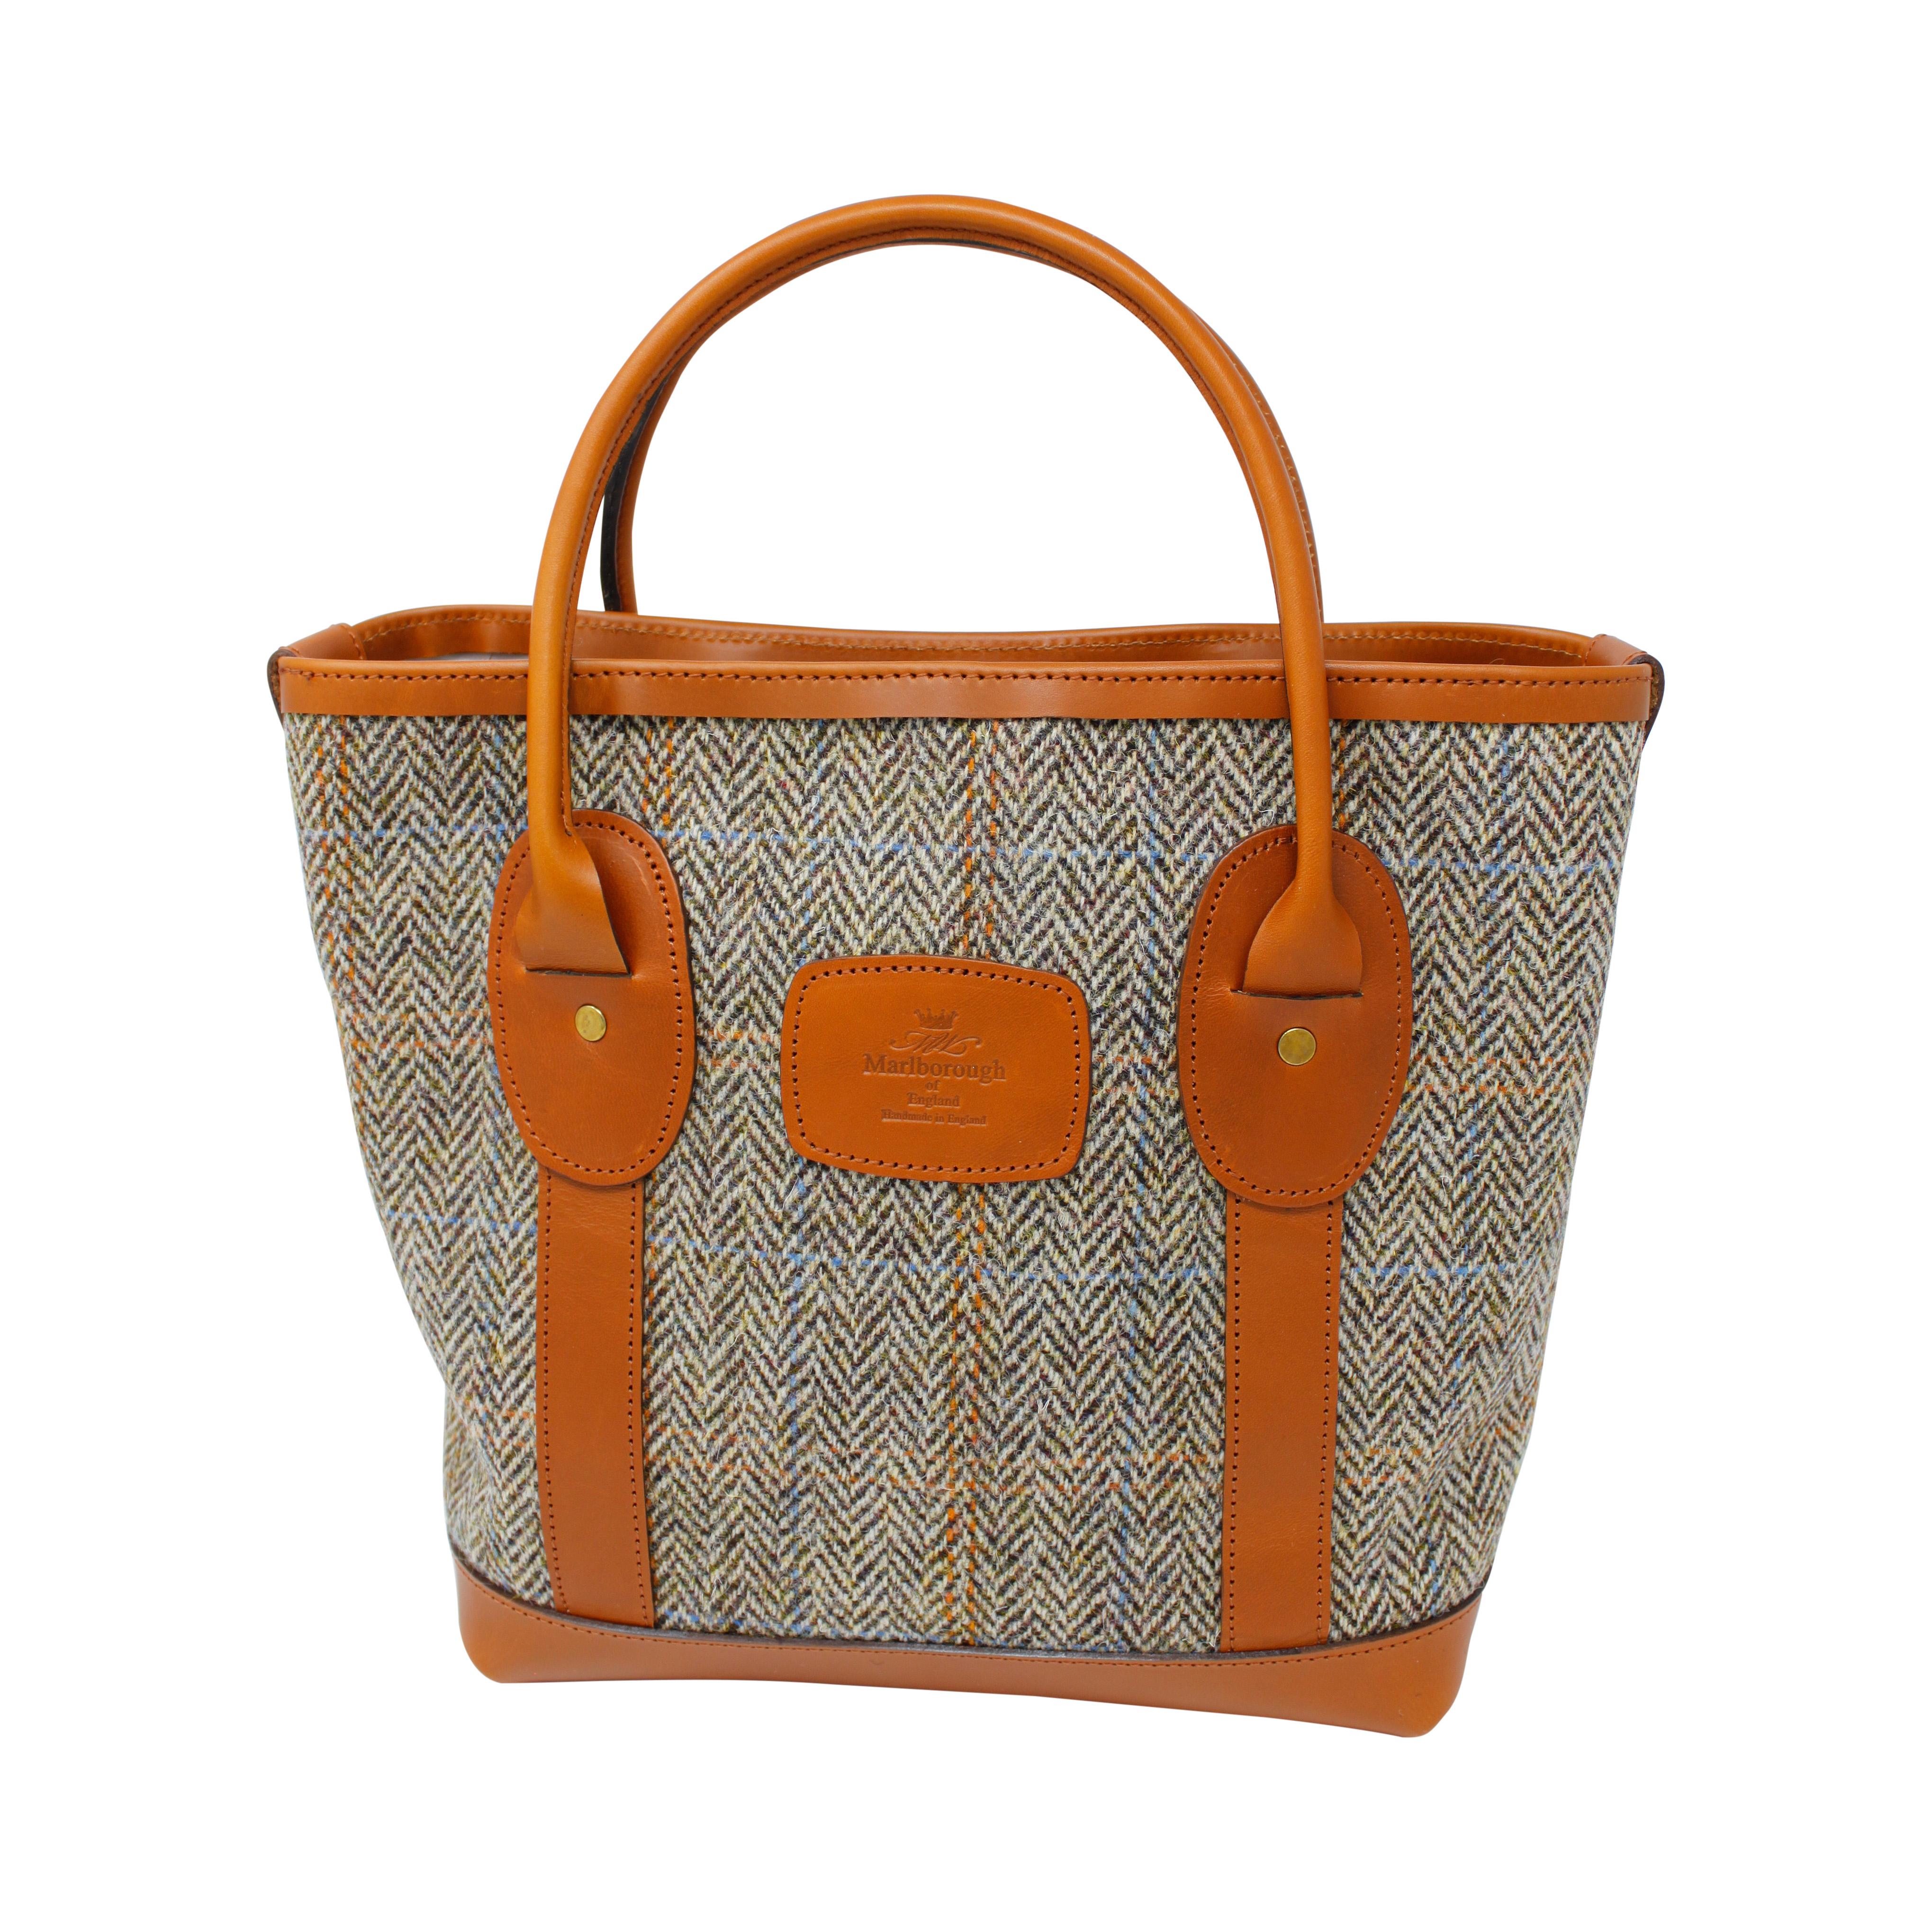 37b86c589538 Mini Tote bag using Tan Harris Tweed and Leather - Marlborough of England